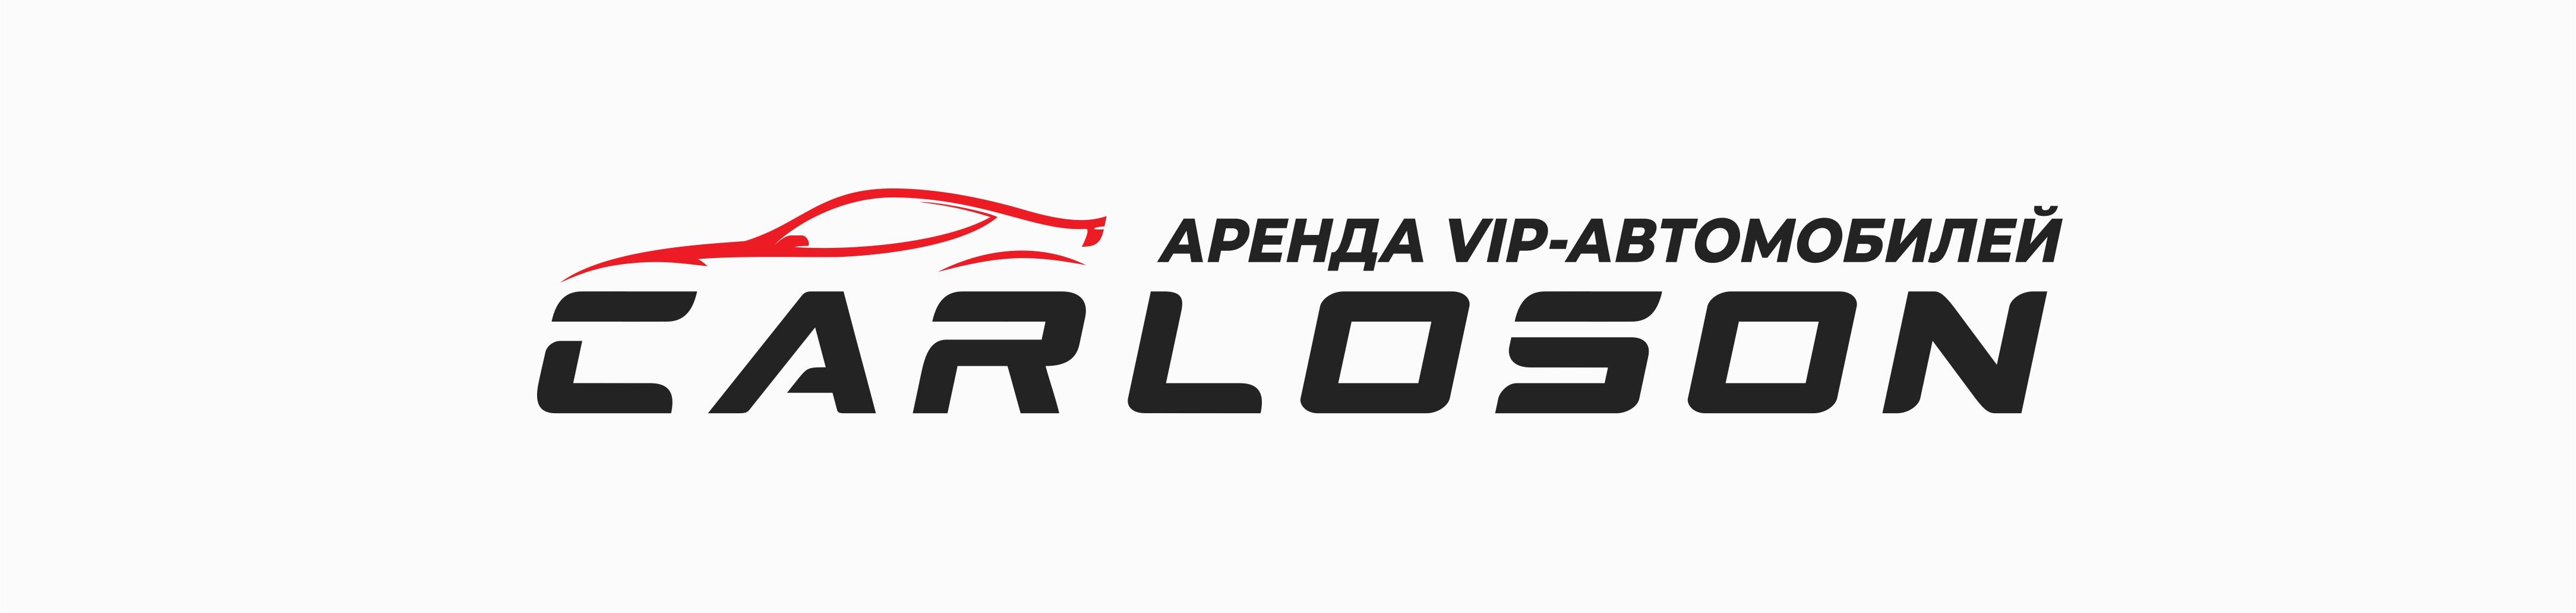 Логотип для компании по прокату  VIP автомобилей фото f_8995adccee63ed77.jpg